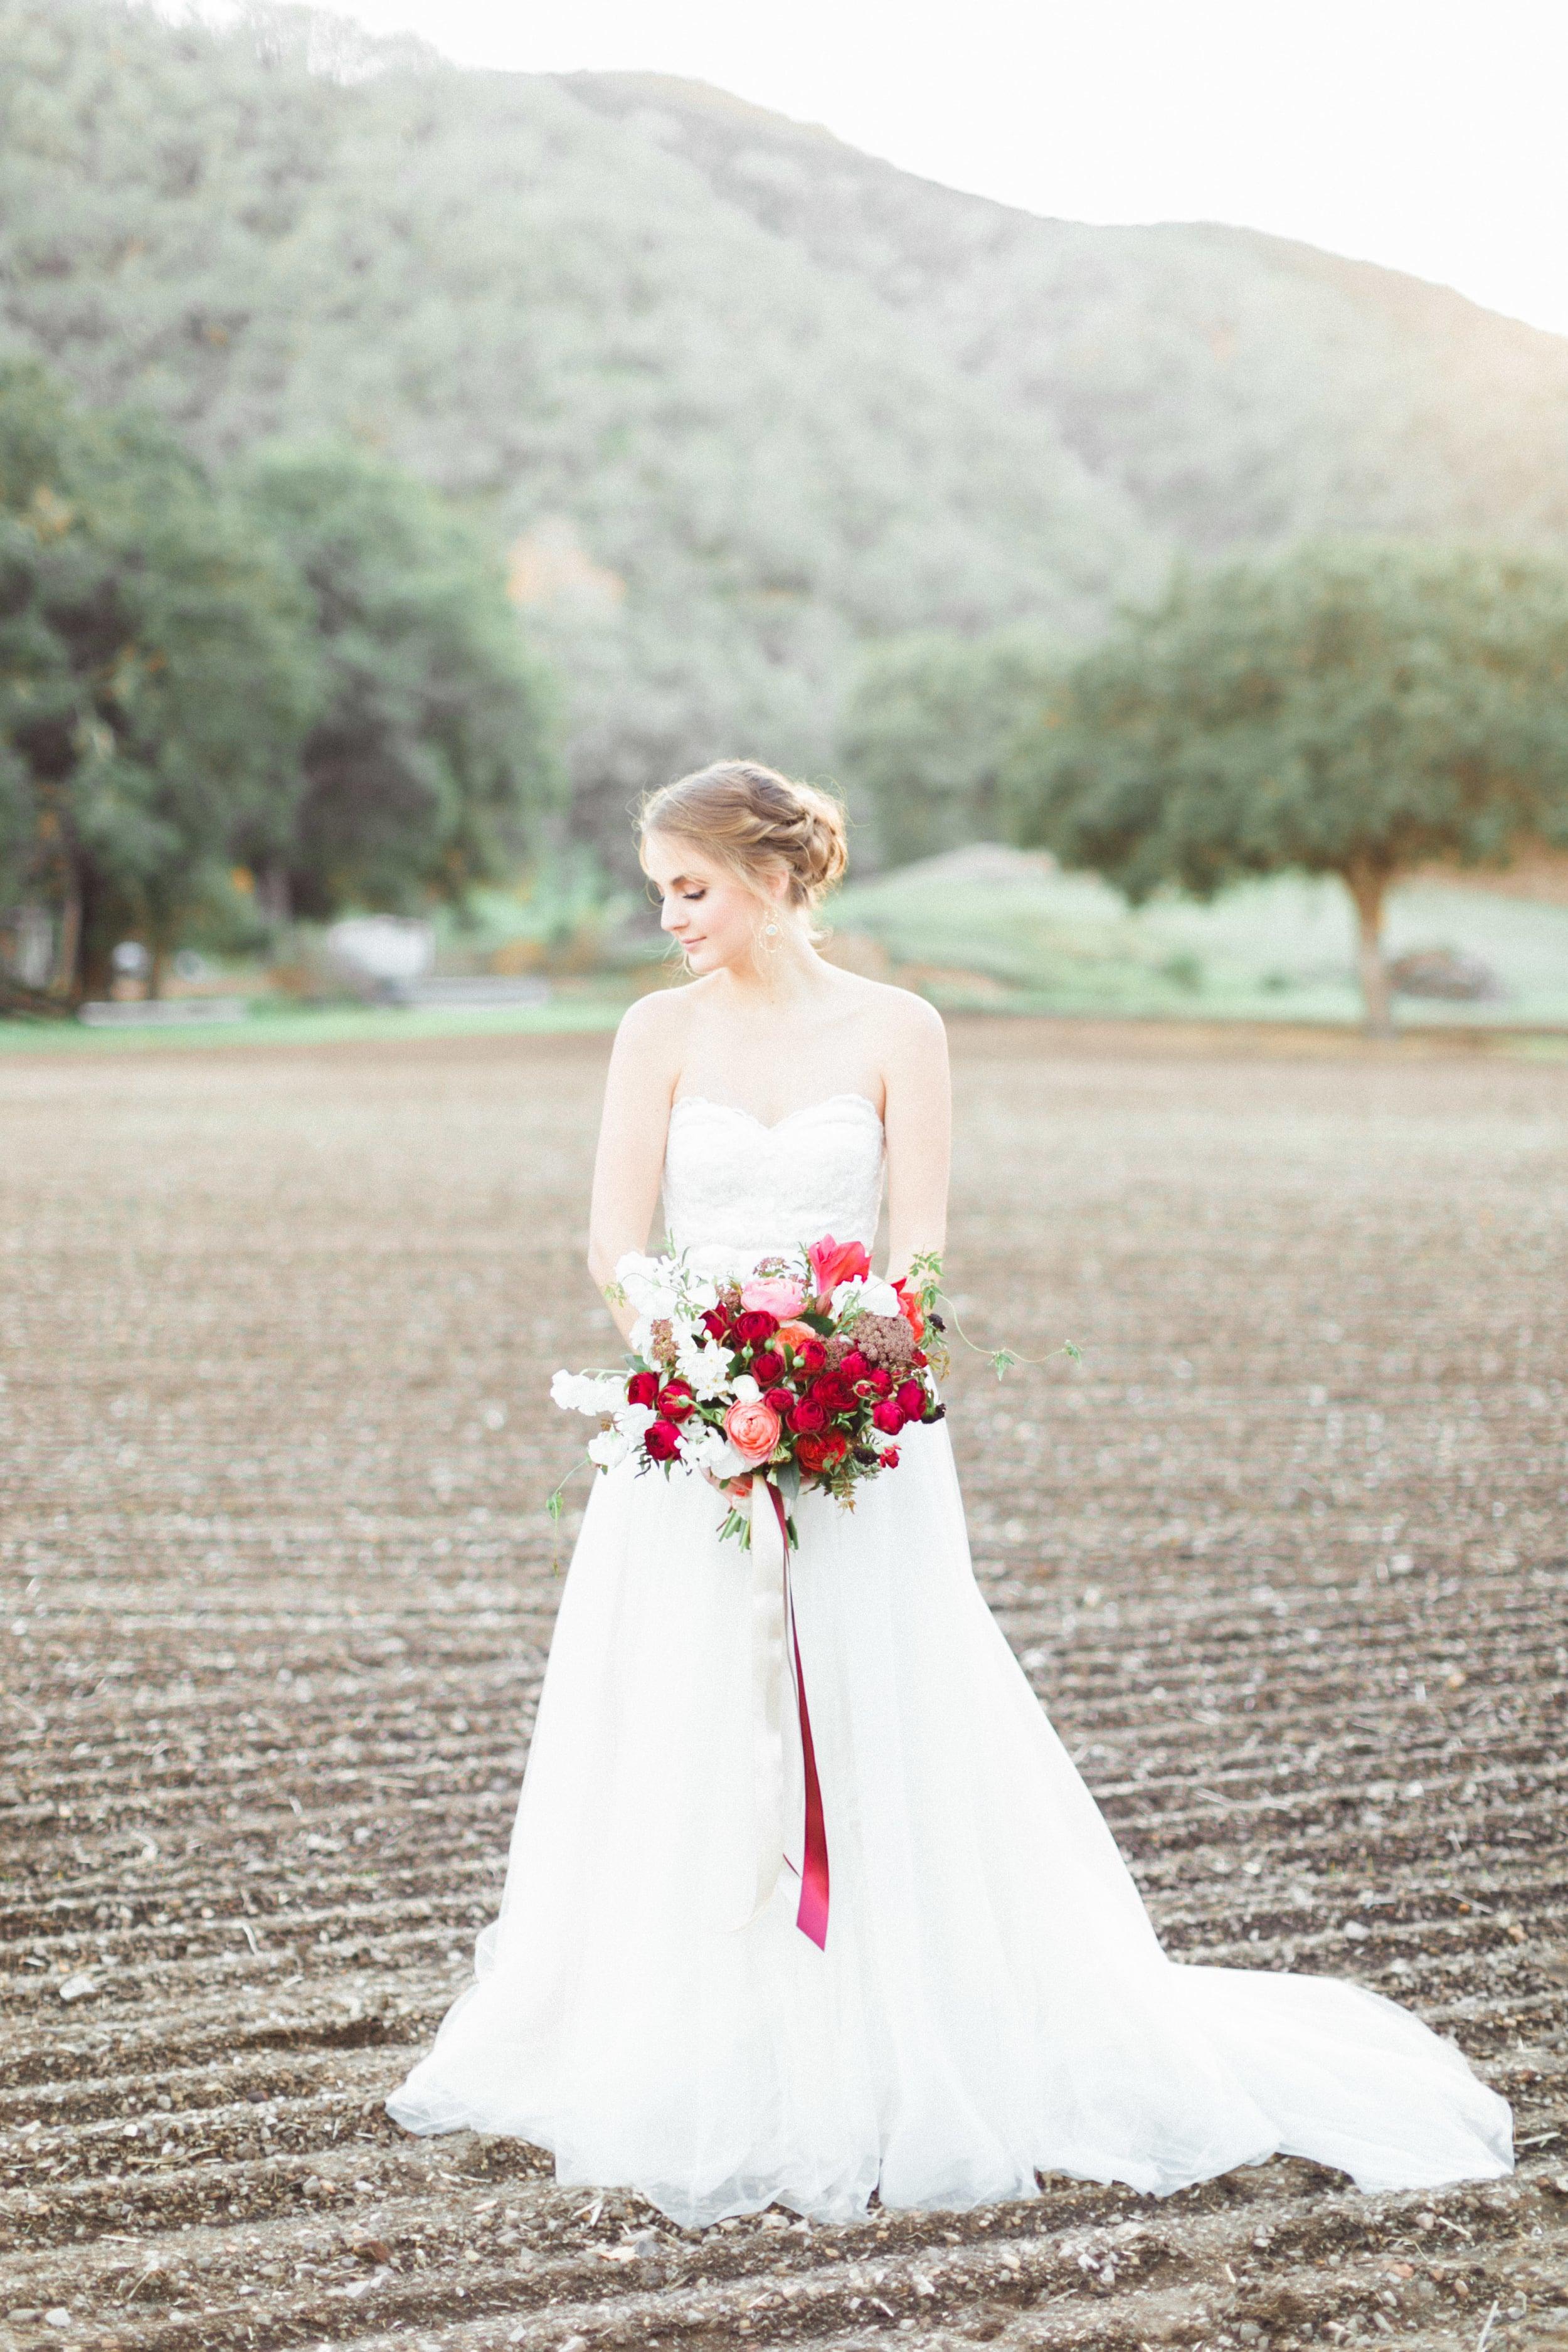 Natalie_Schutt_Photography_Winter_Wedding_San_Luis_Obispo-196.jpg